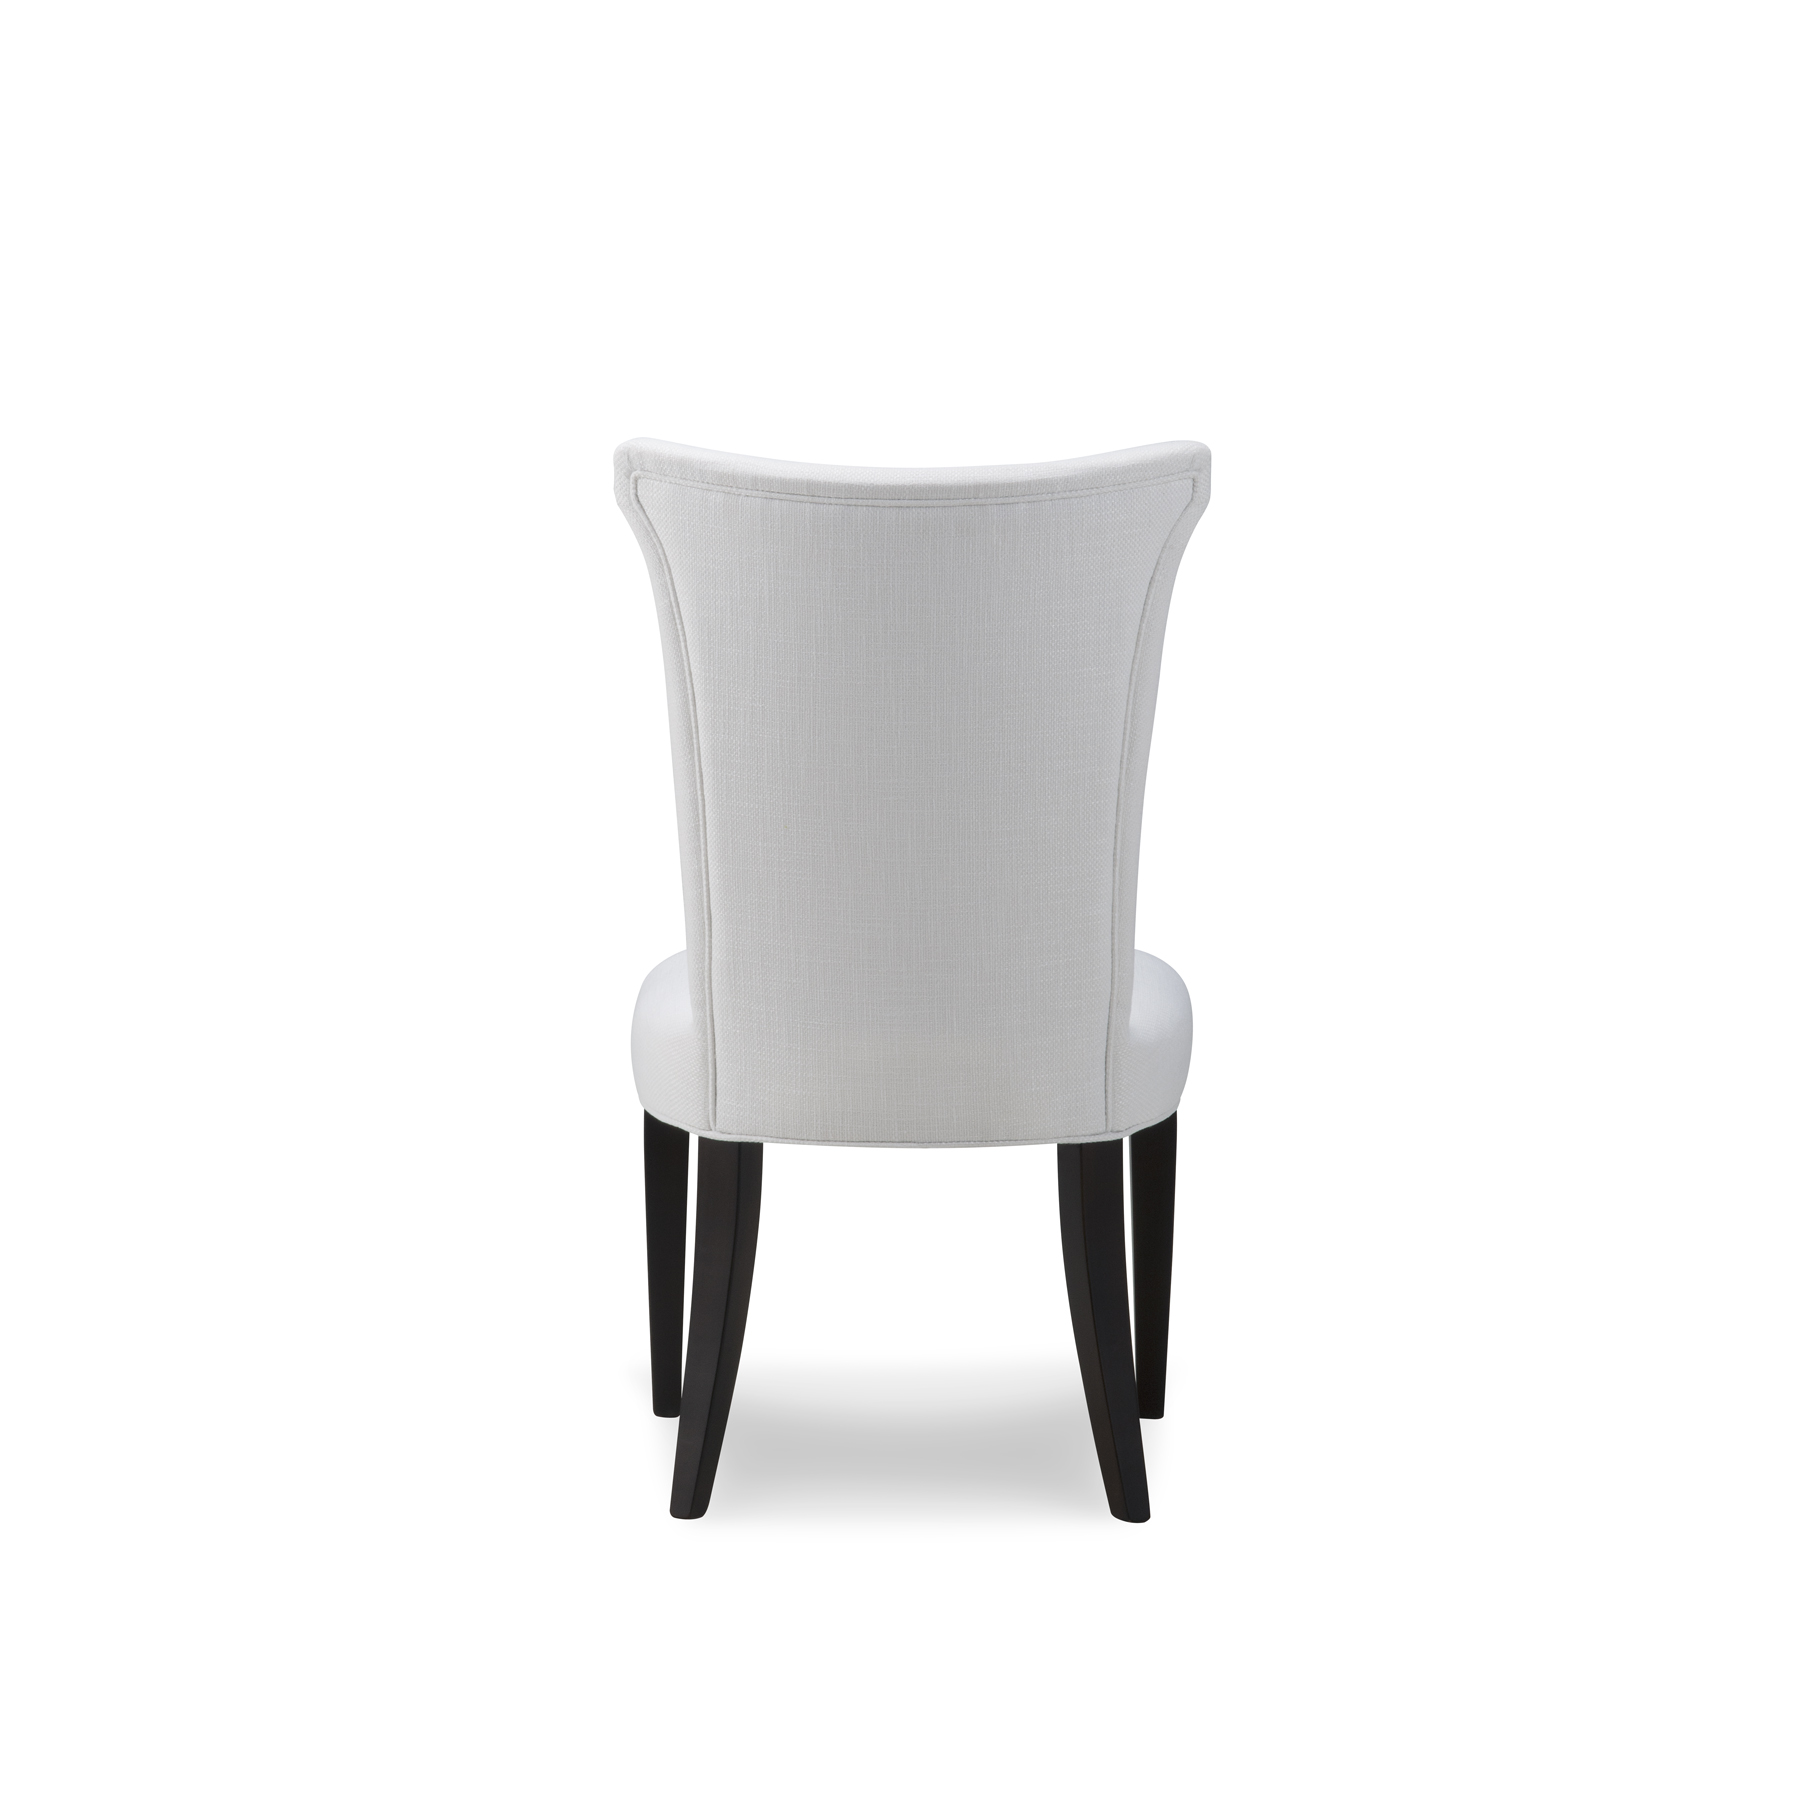 Regal-Chair-B-PROOF-1-1.jpg